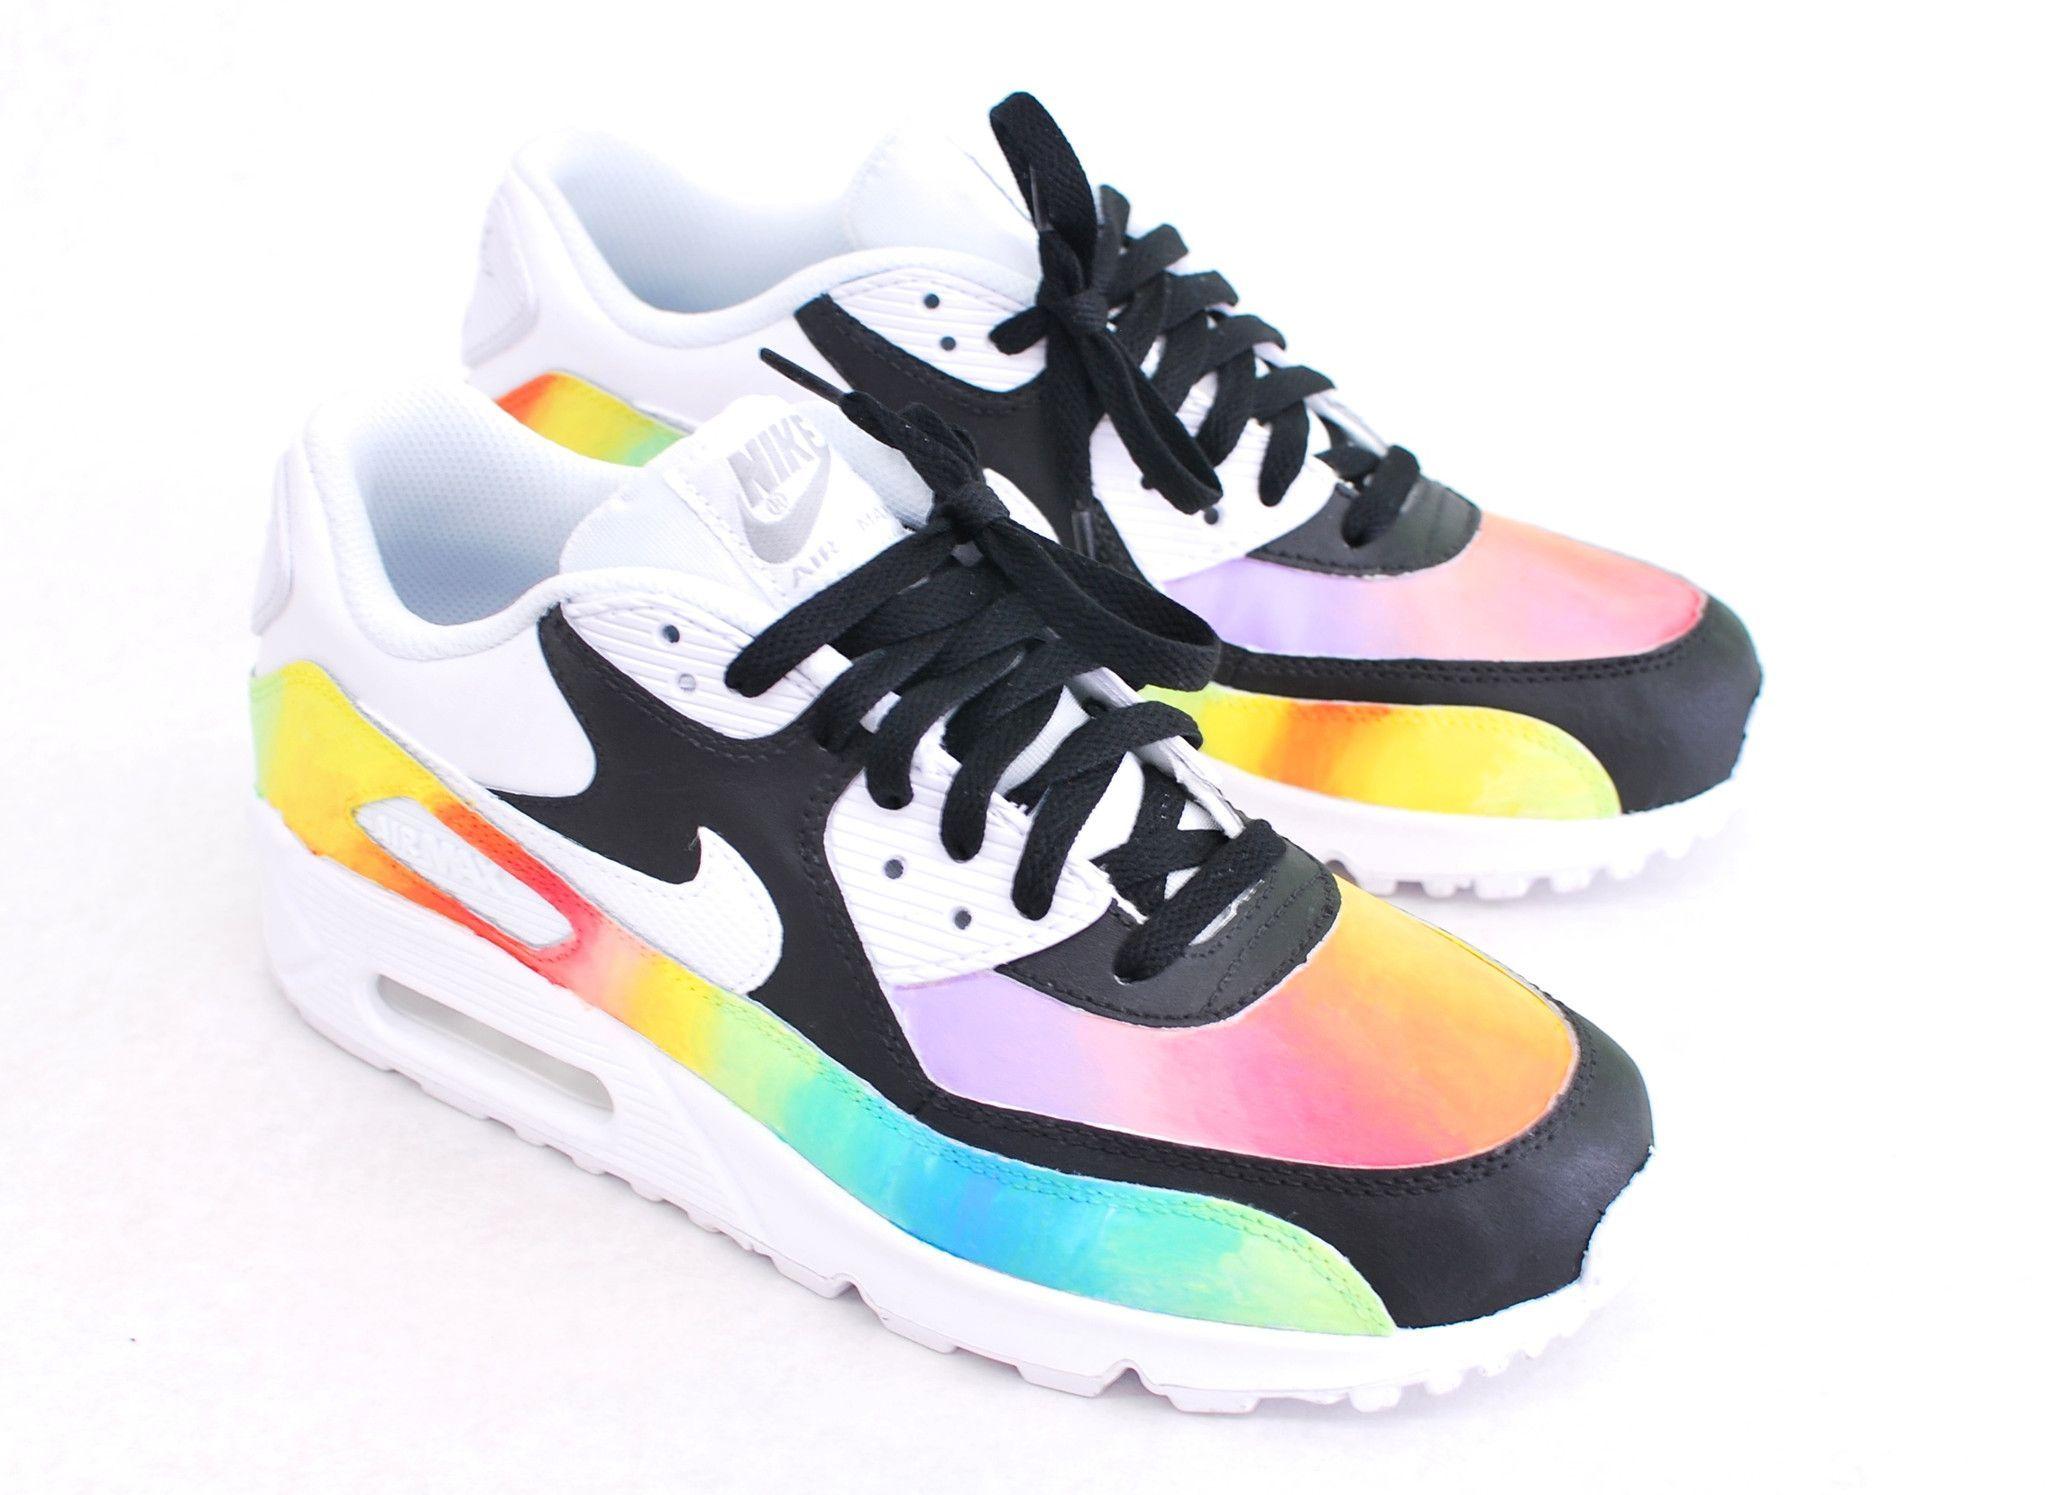 Custom Hand Painted Color Blast Nike Air Max 90 Running Shoe